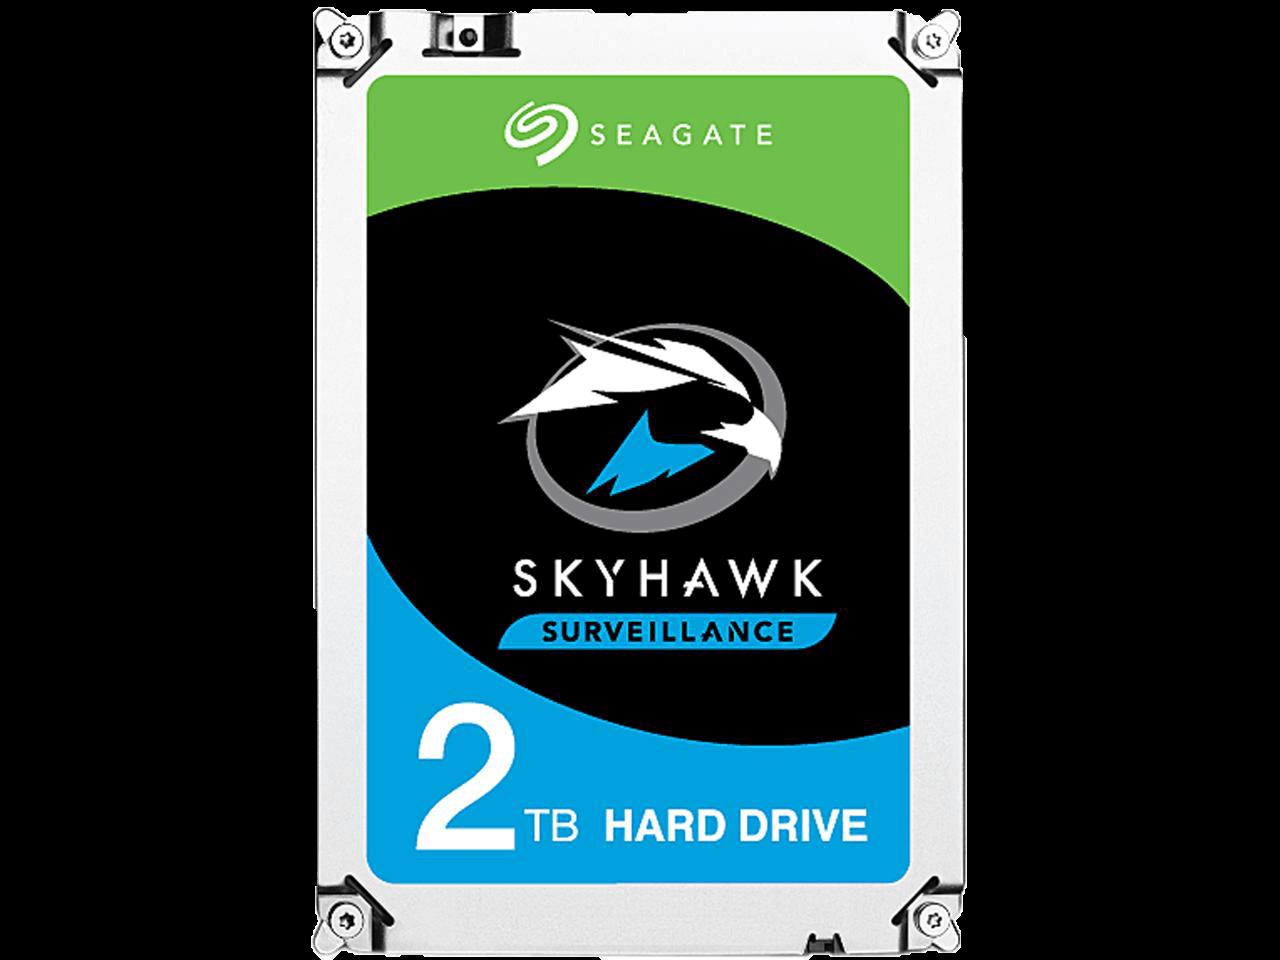 SLEVA SEAGATE SkyHawk ST2000VX003 2TB 15689